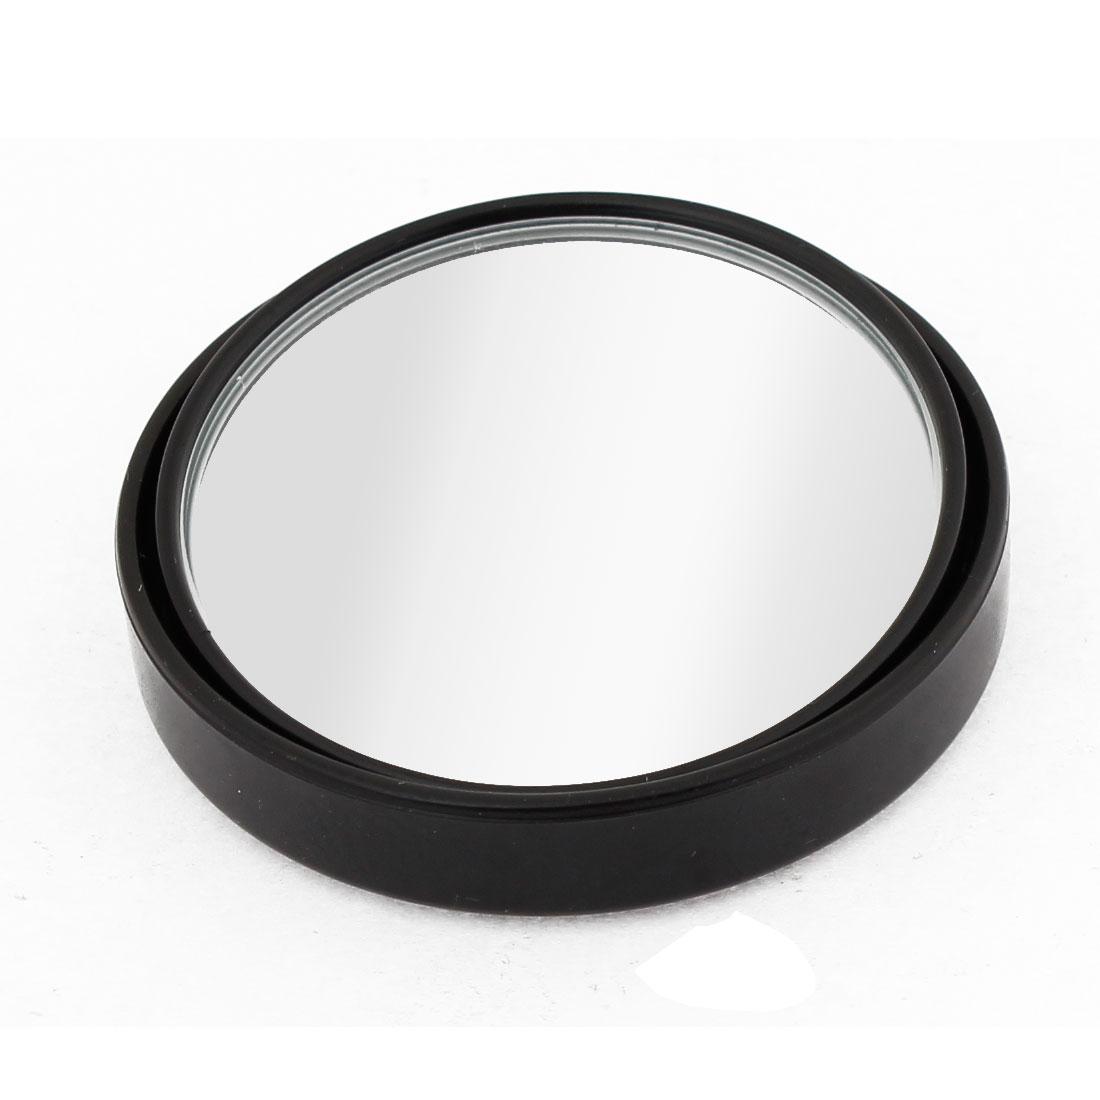 50mm Diameter Convex Rear View Blind Spot Mirror Black for Car Vehicle